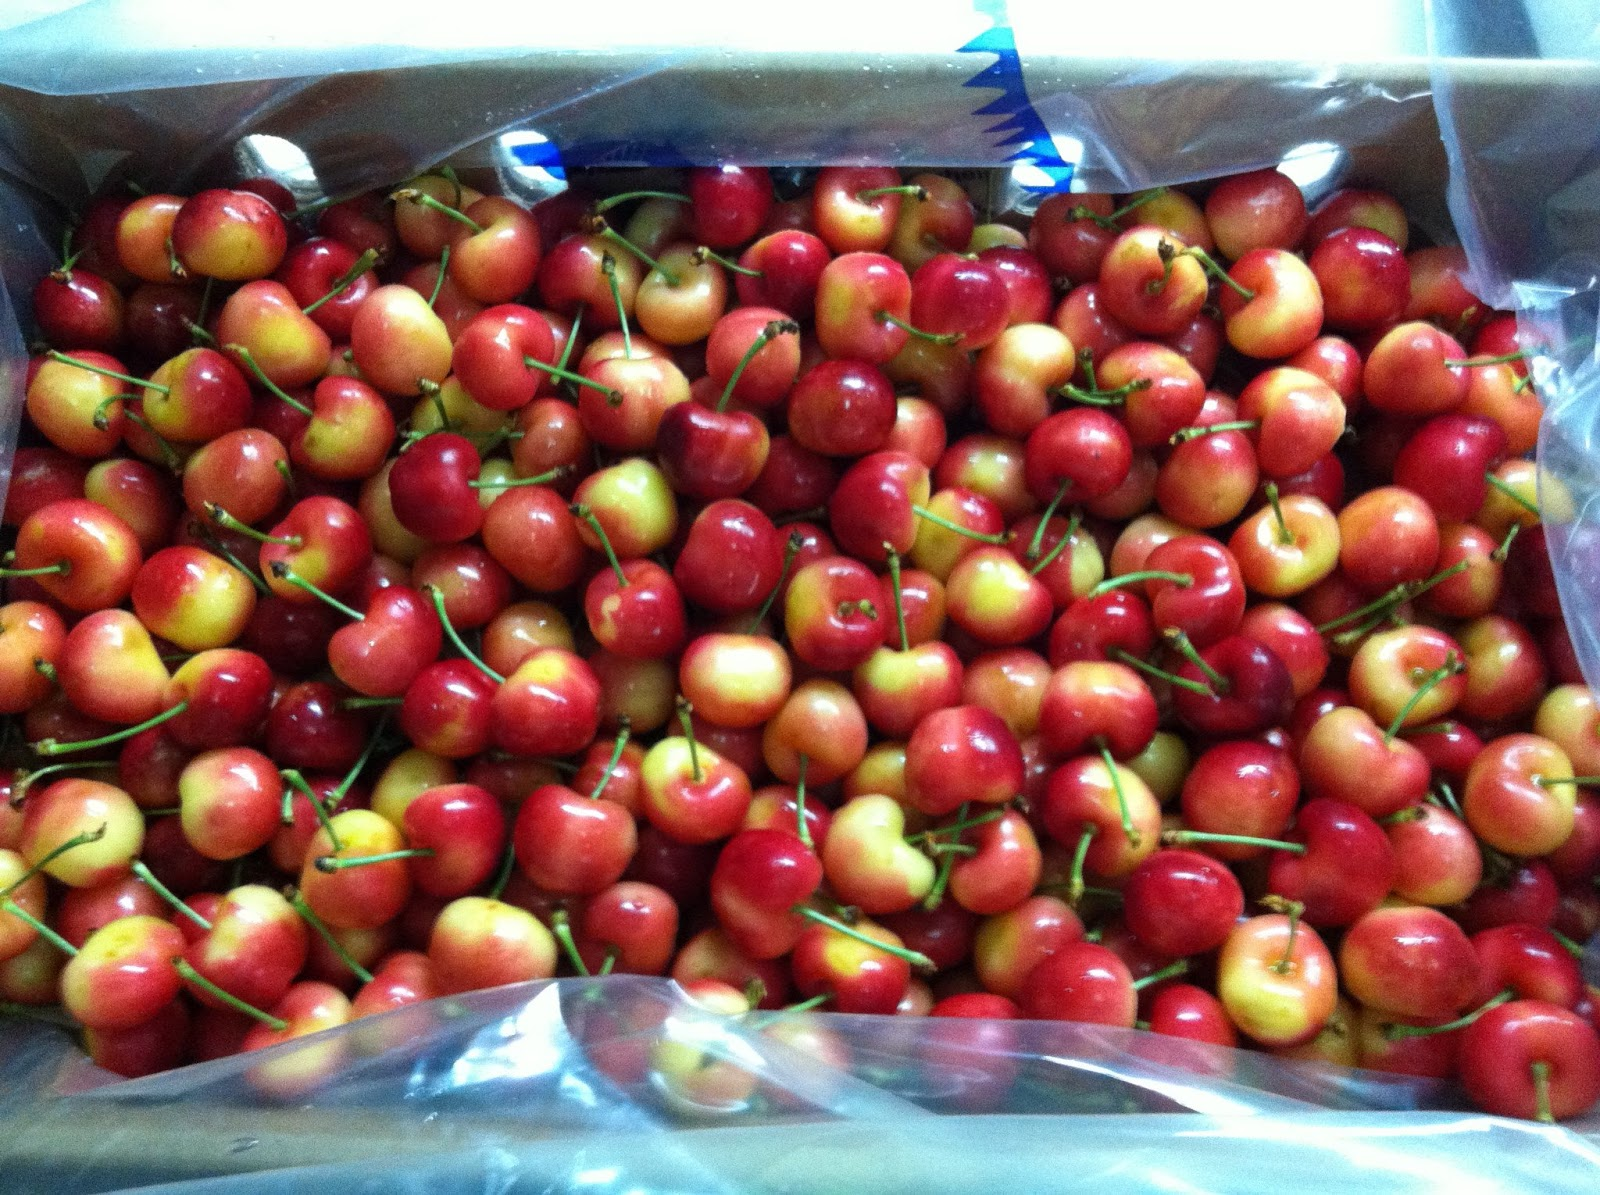 produce clerk the produce clerks handbook by rick chong fresh packed rainier cherries destined for